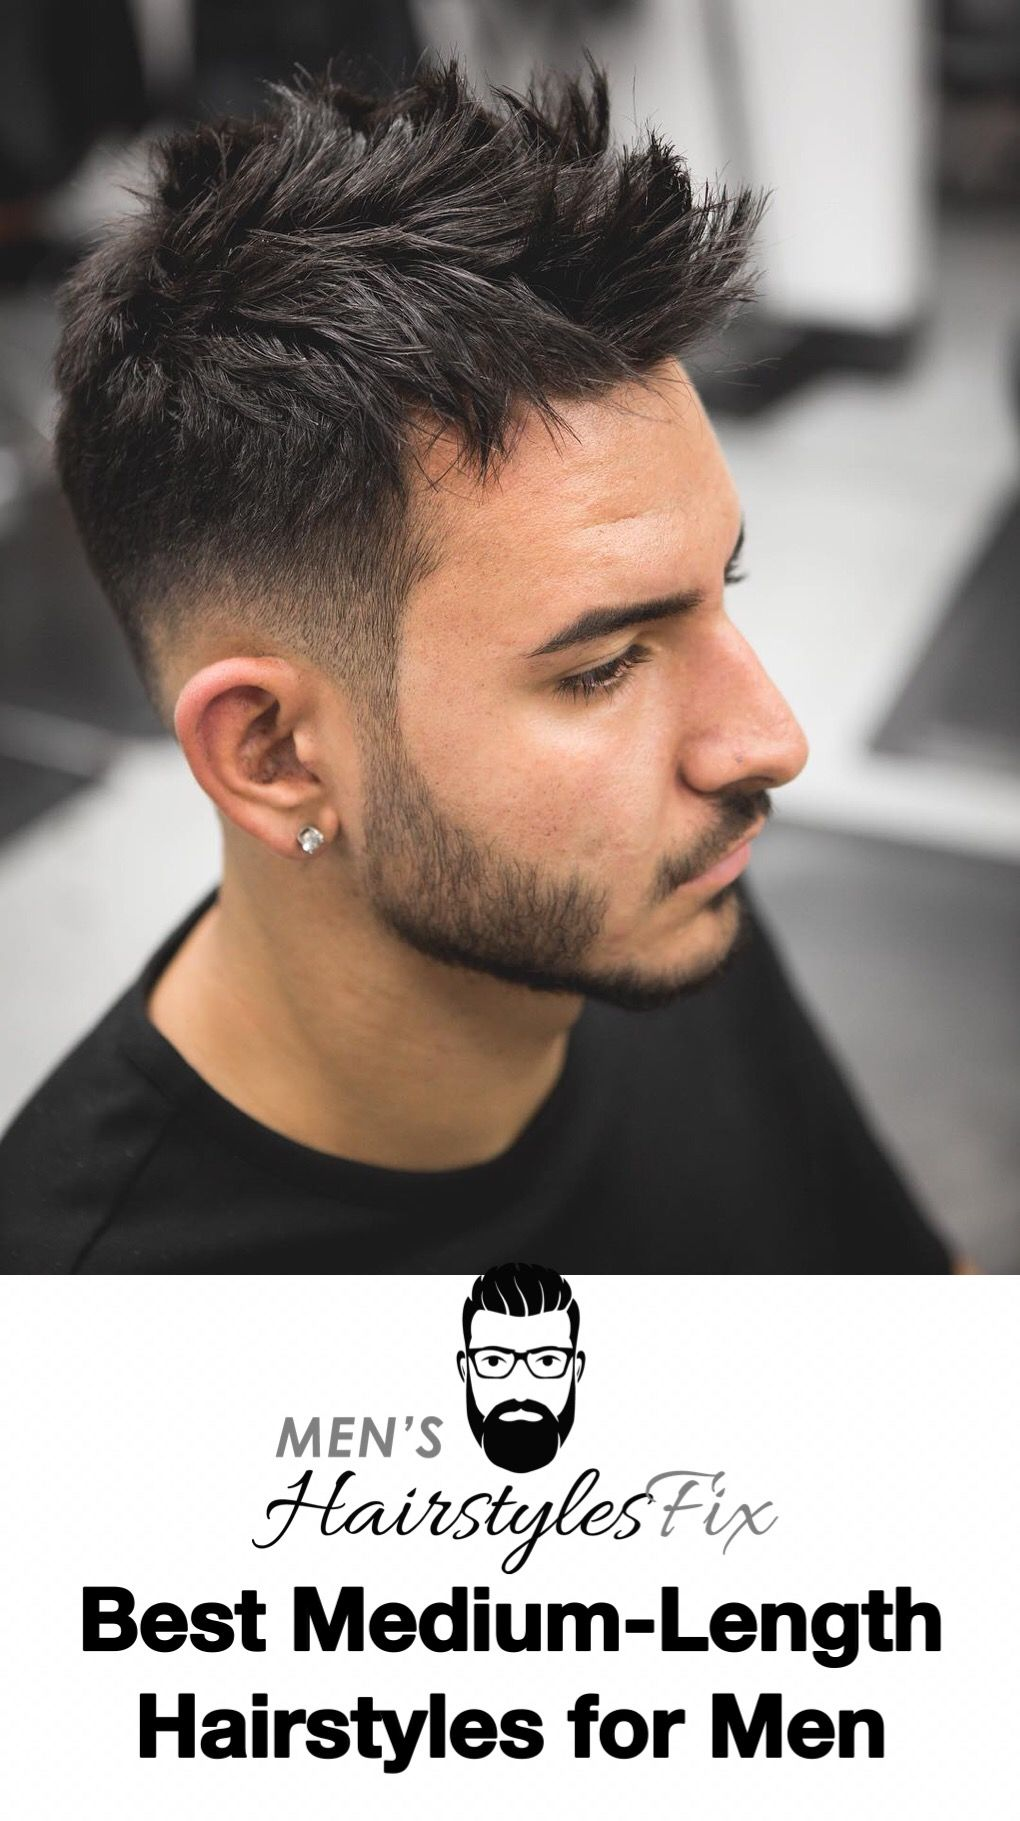 best mediumlength hairstyles for men in best hairstyles